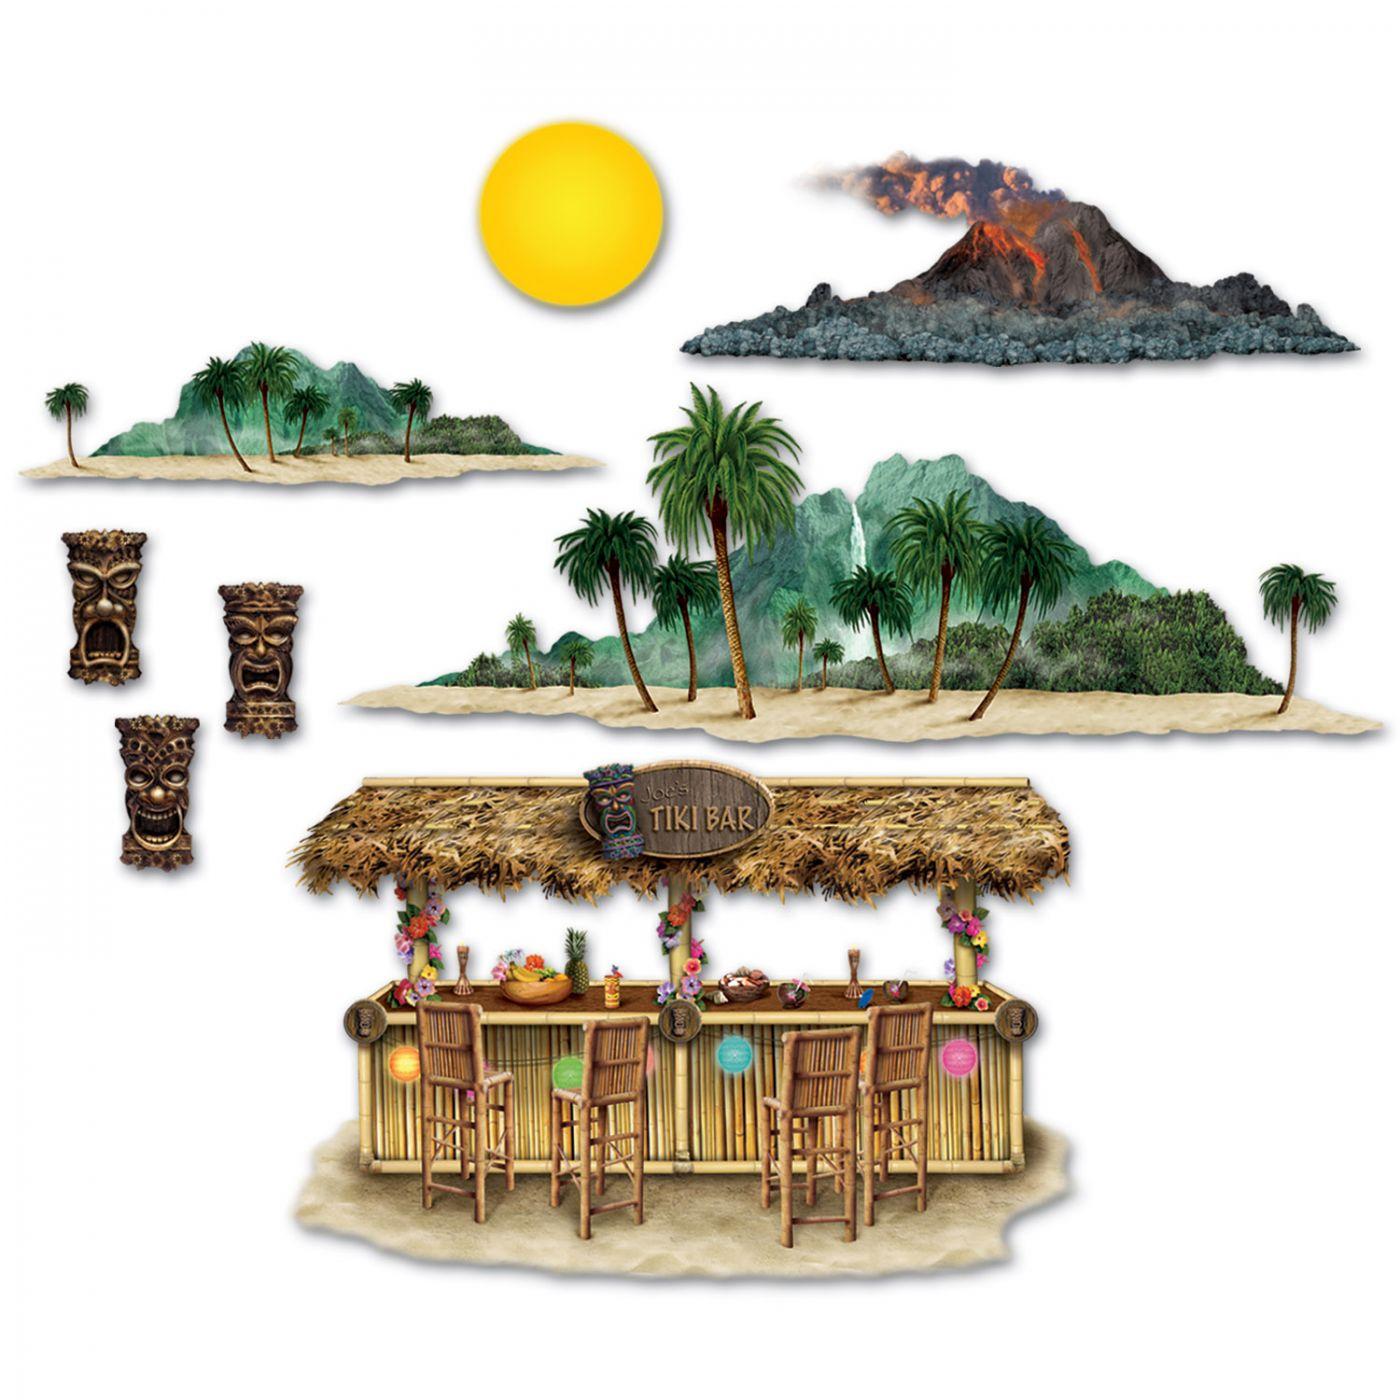 Tiki Bar & Island Props image